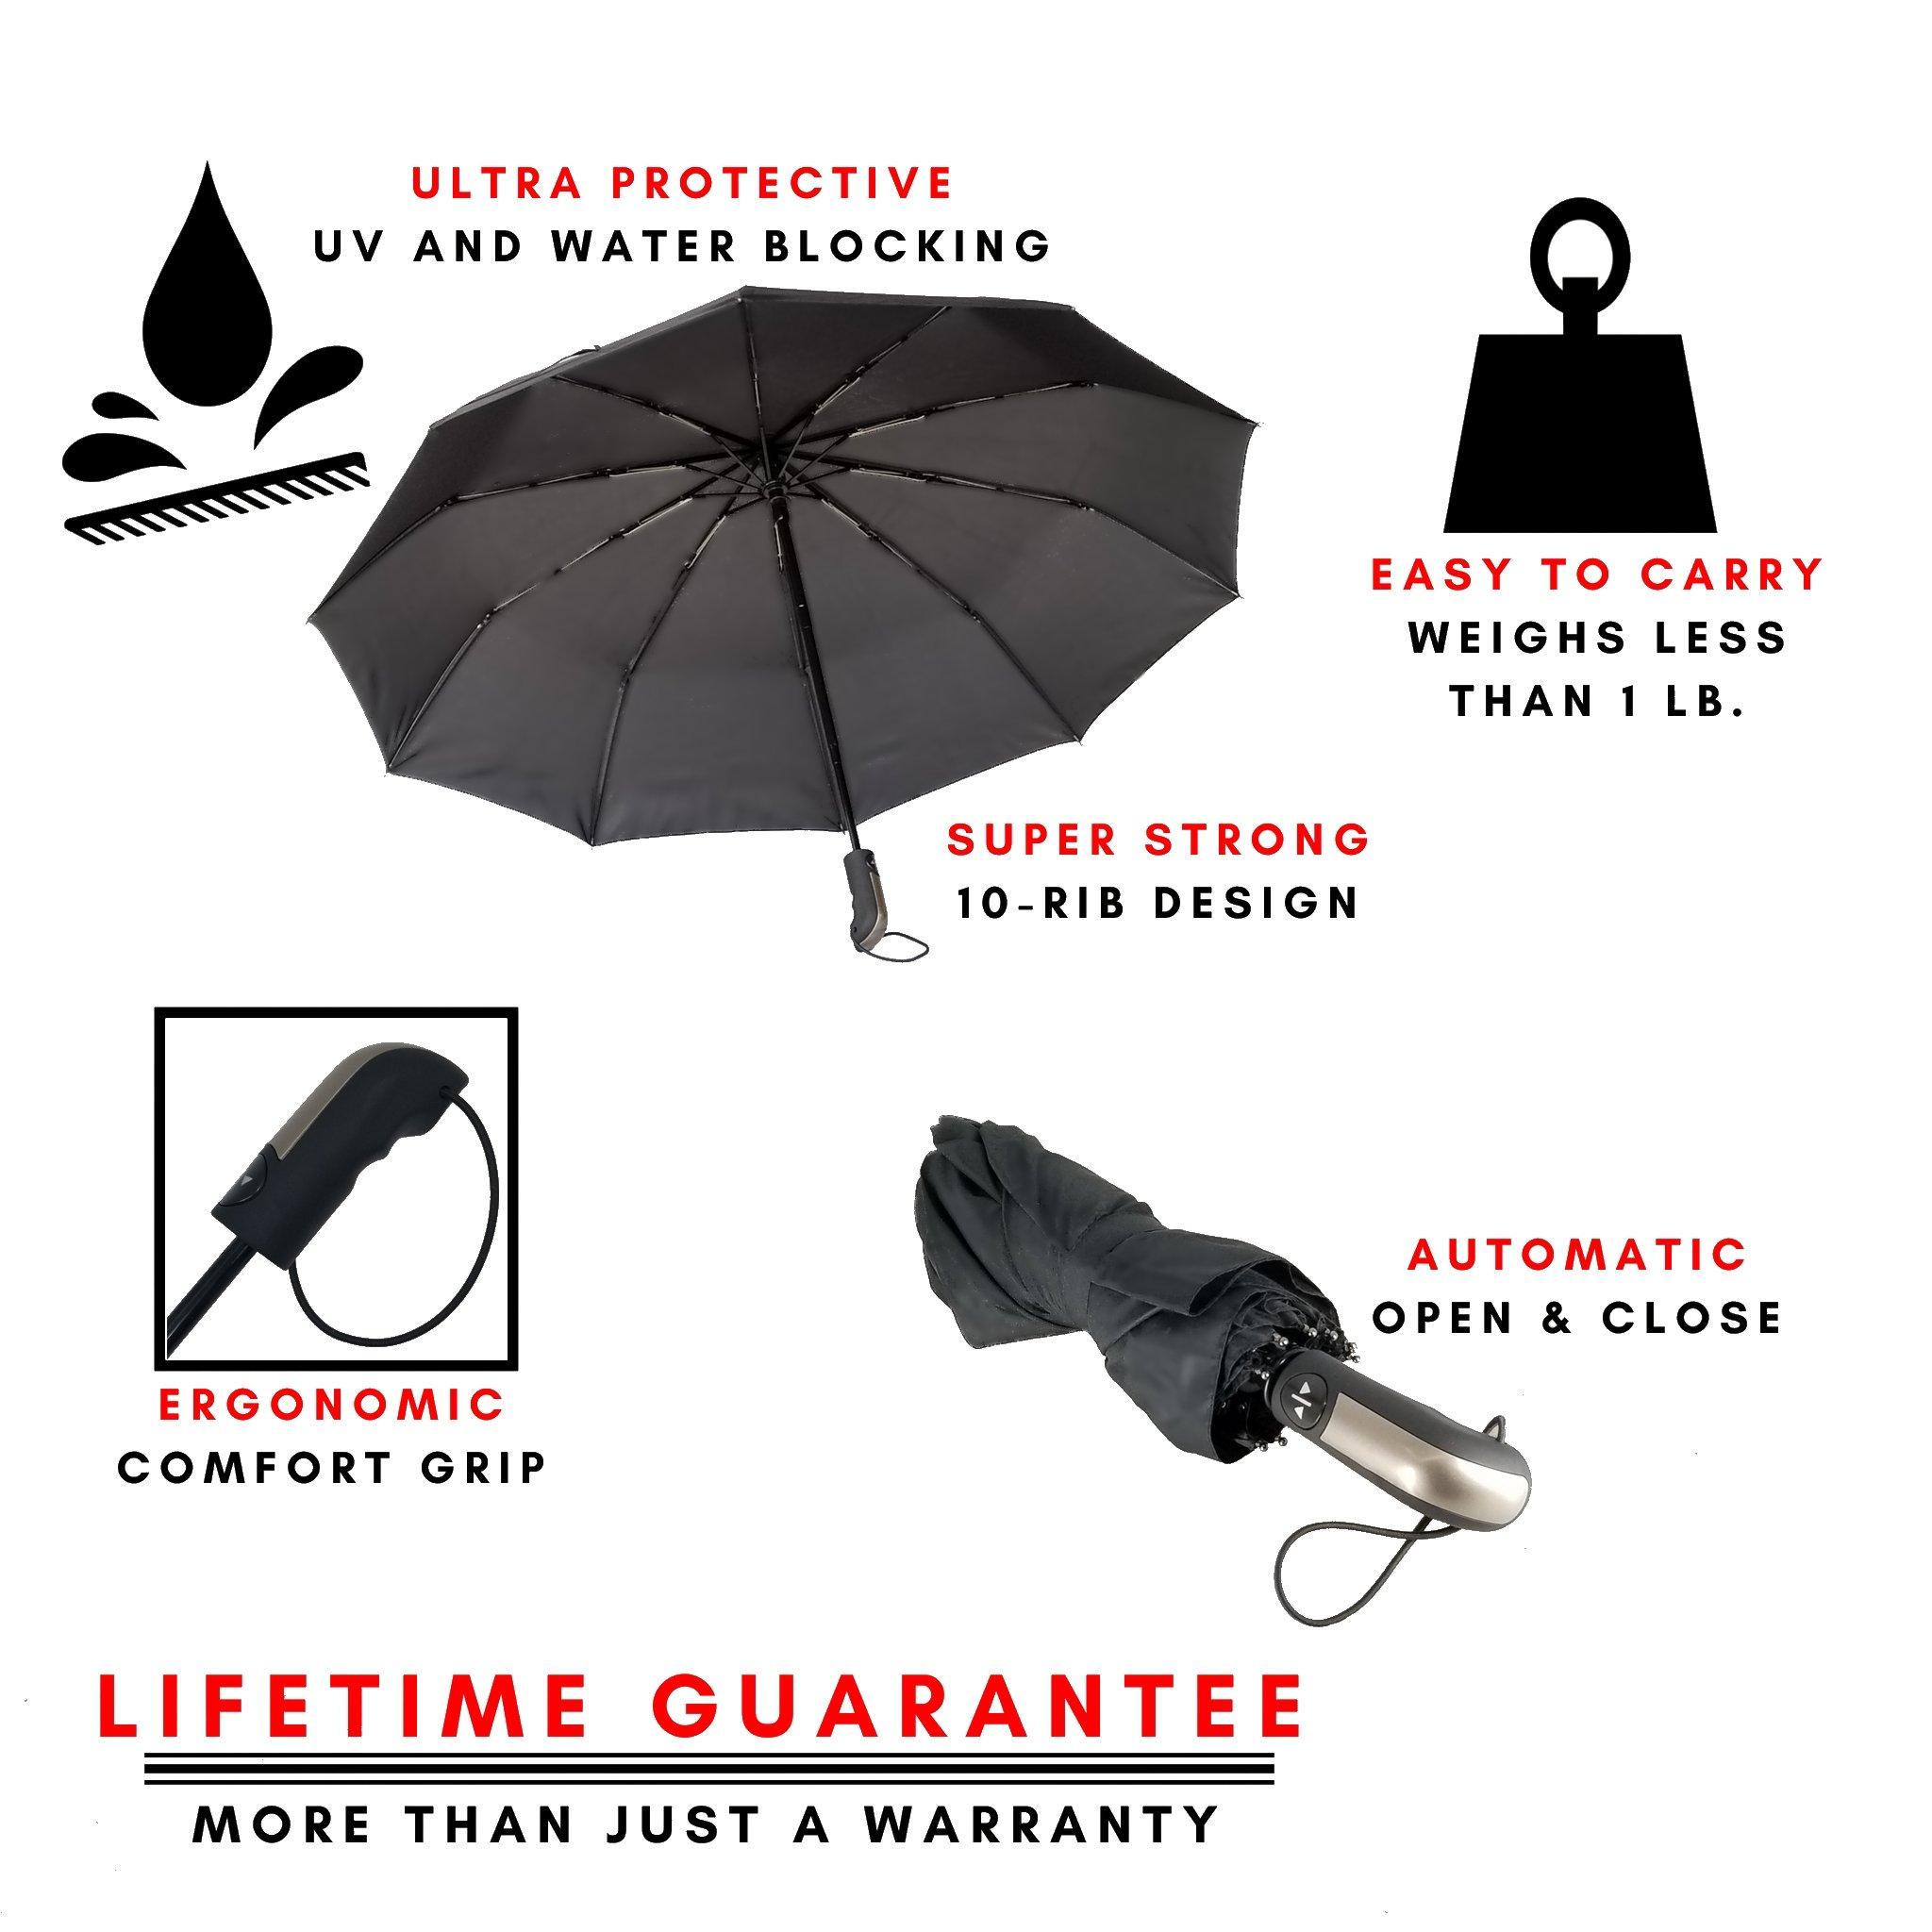 Compact Windproof Travel Umbrella -FREE Mini Black Umbrella- Katzendaügs 2pc Black by Katzendaügs Umbrella Co. (Image #3)